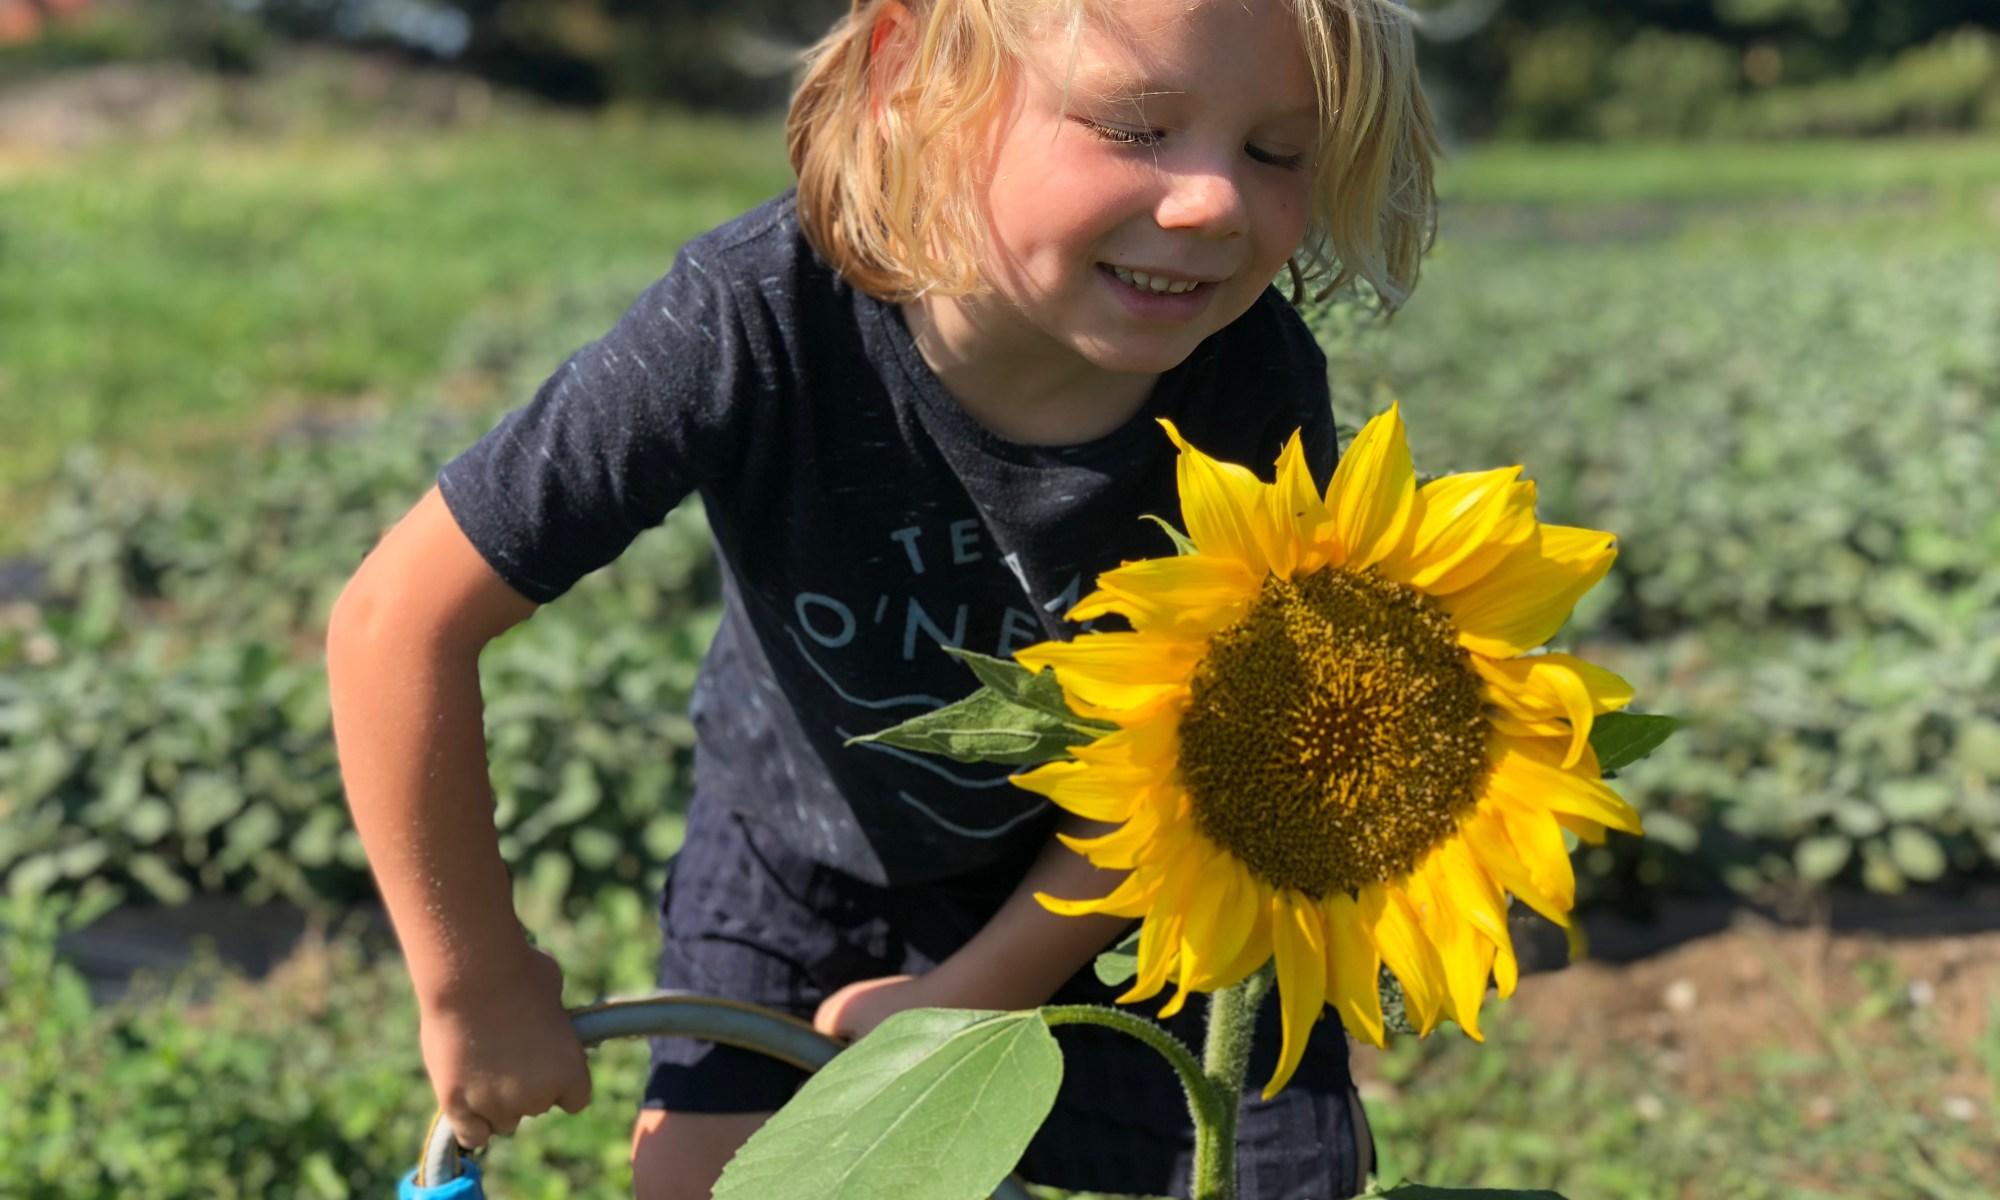 Josef and the sunflower, Telegraph Track Wallington Naturallythinking